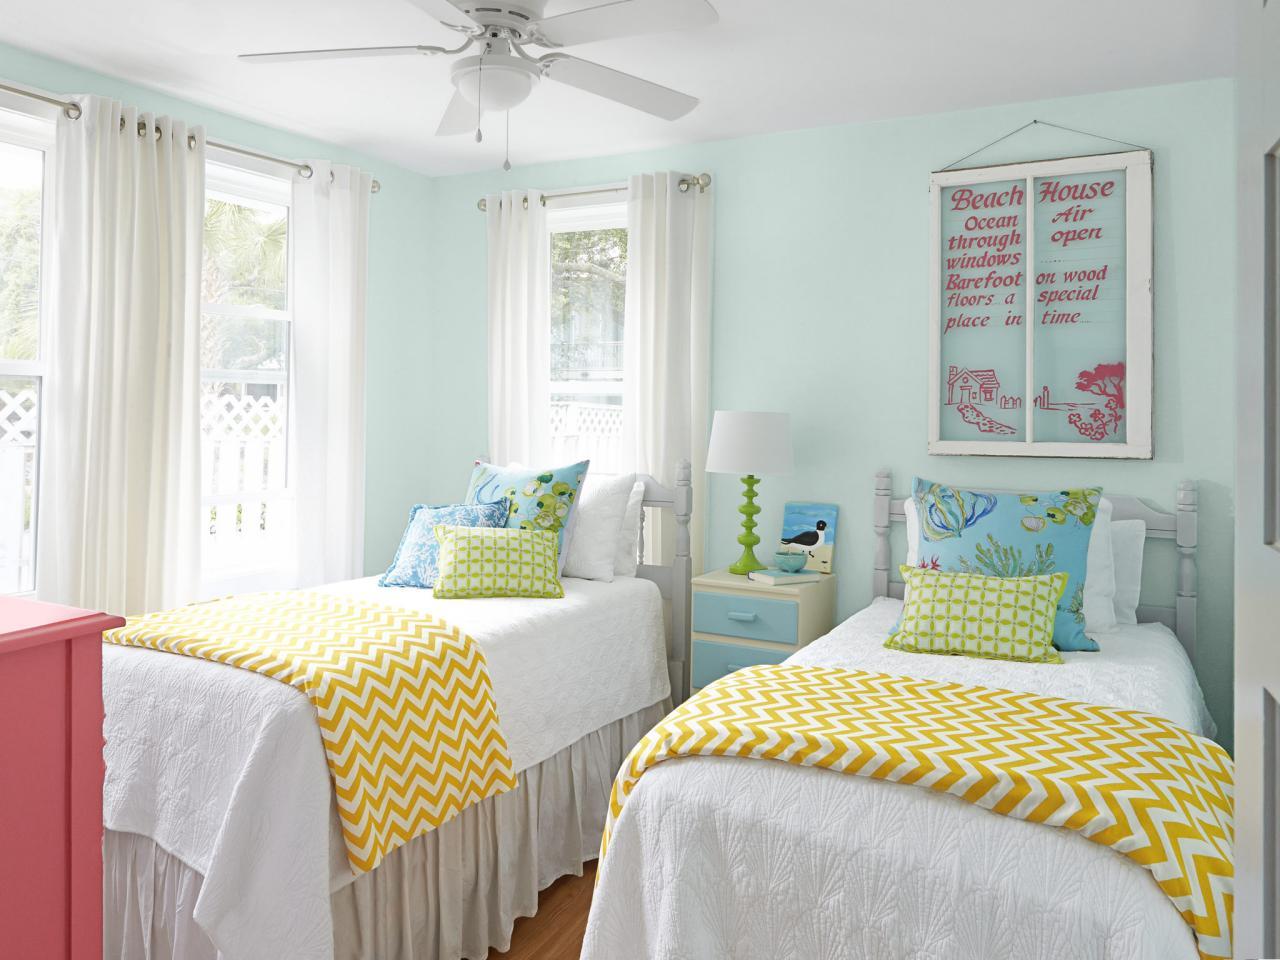 Guest Room Renovations : Home renovation in tybee island georgia interior design